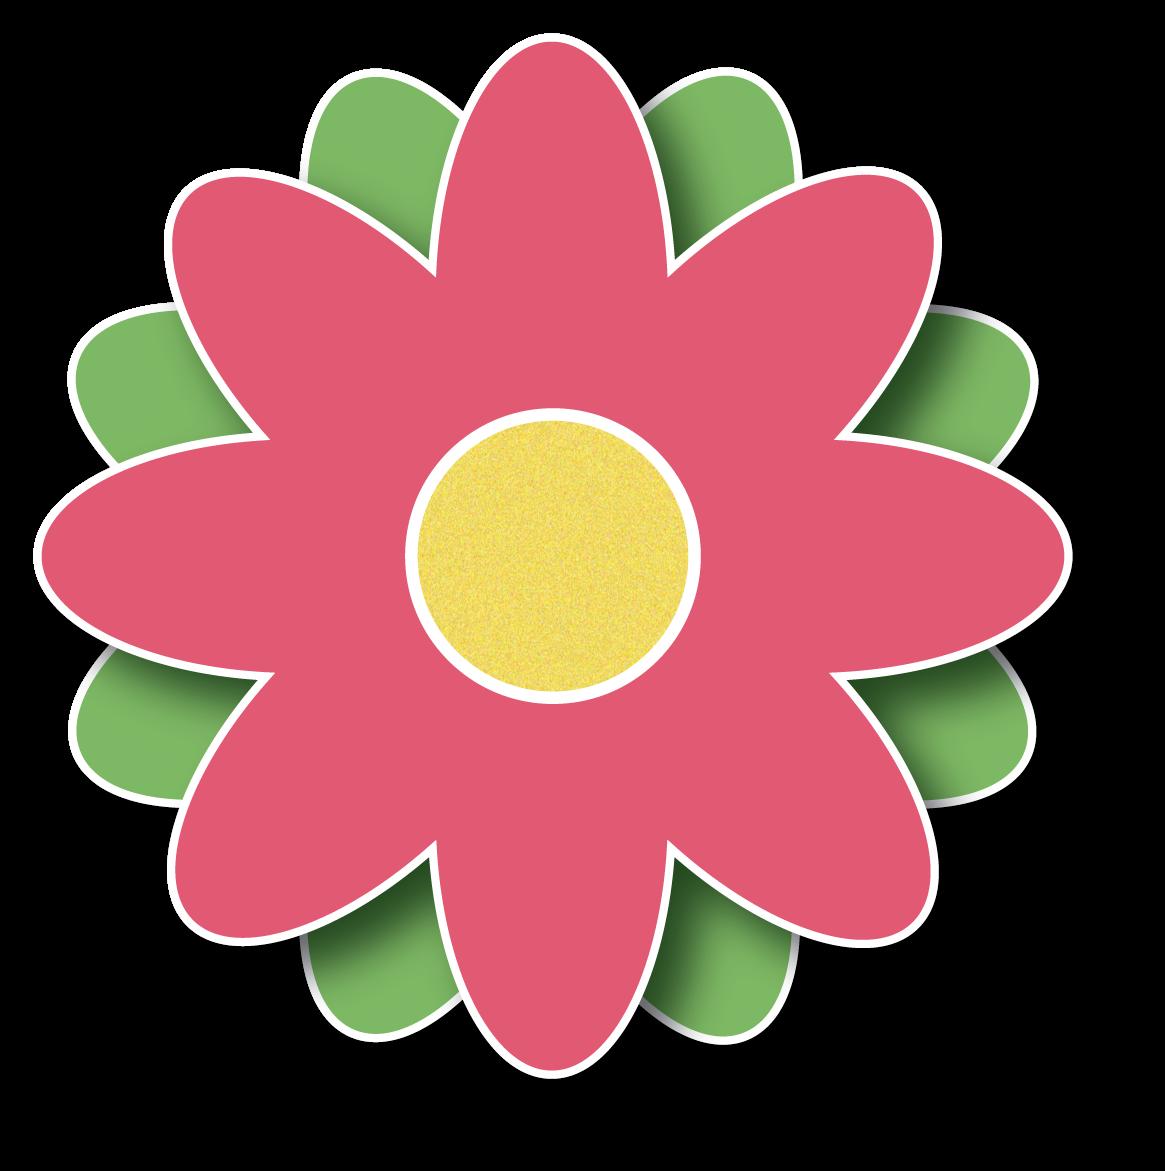 1684246582-spring-flowers-clip .-1684246582-spring-flowers-clip .-6